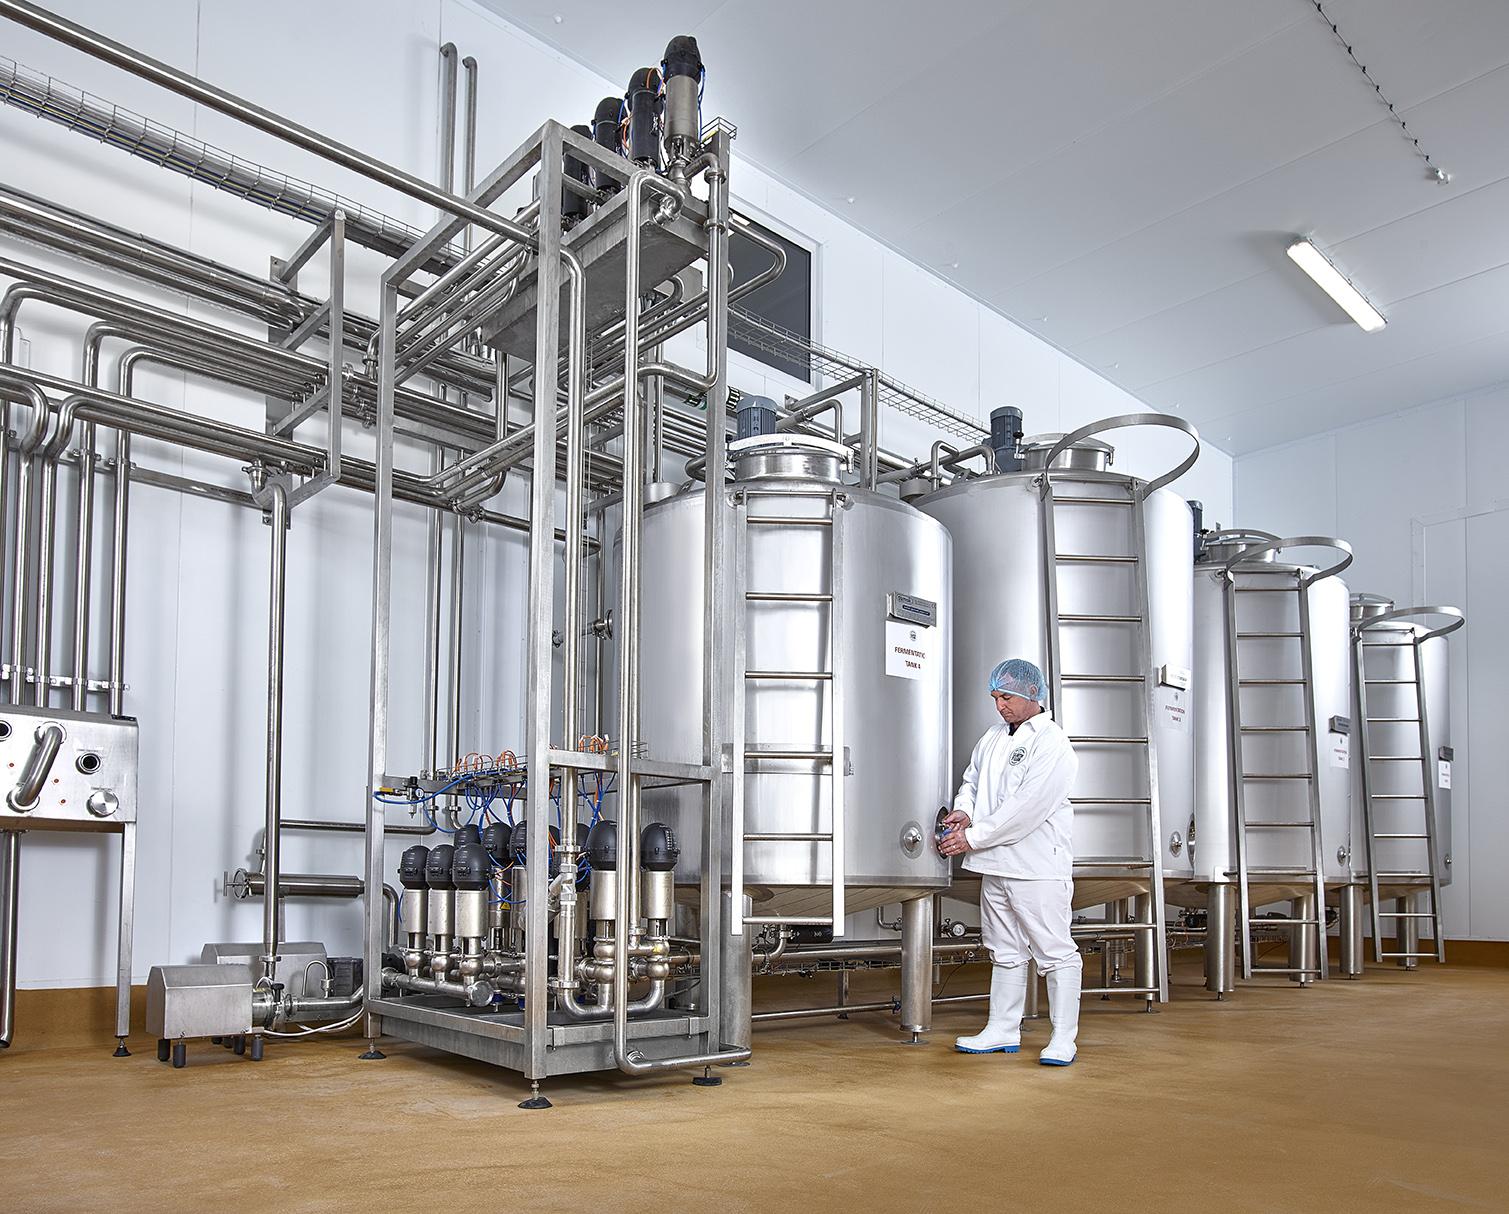 post_1785415-fermentation-and-valve-matrix-2.jpg